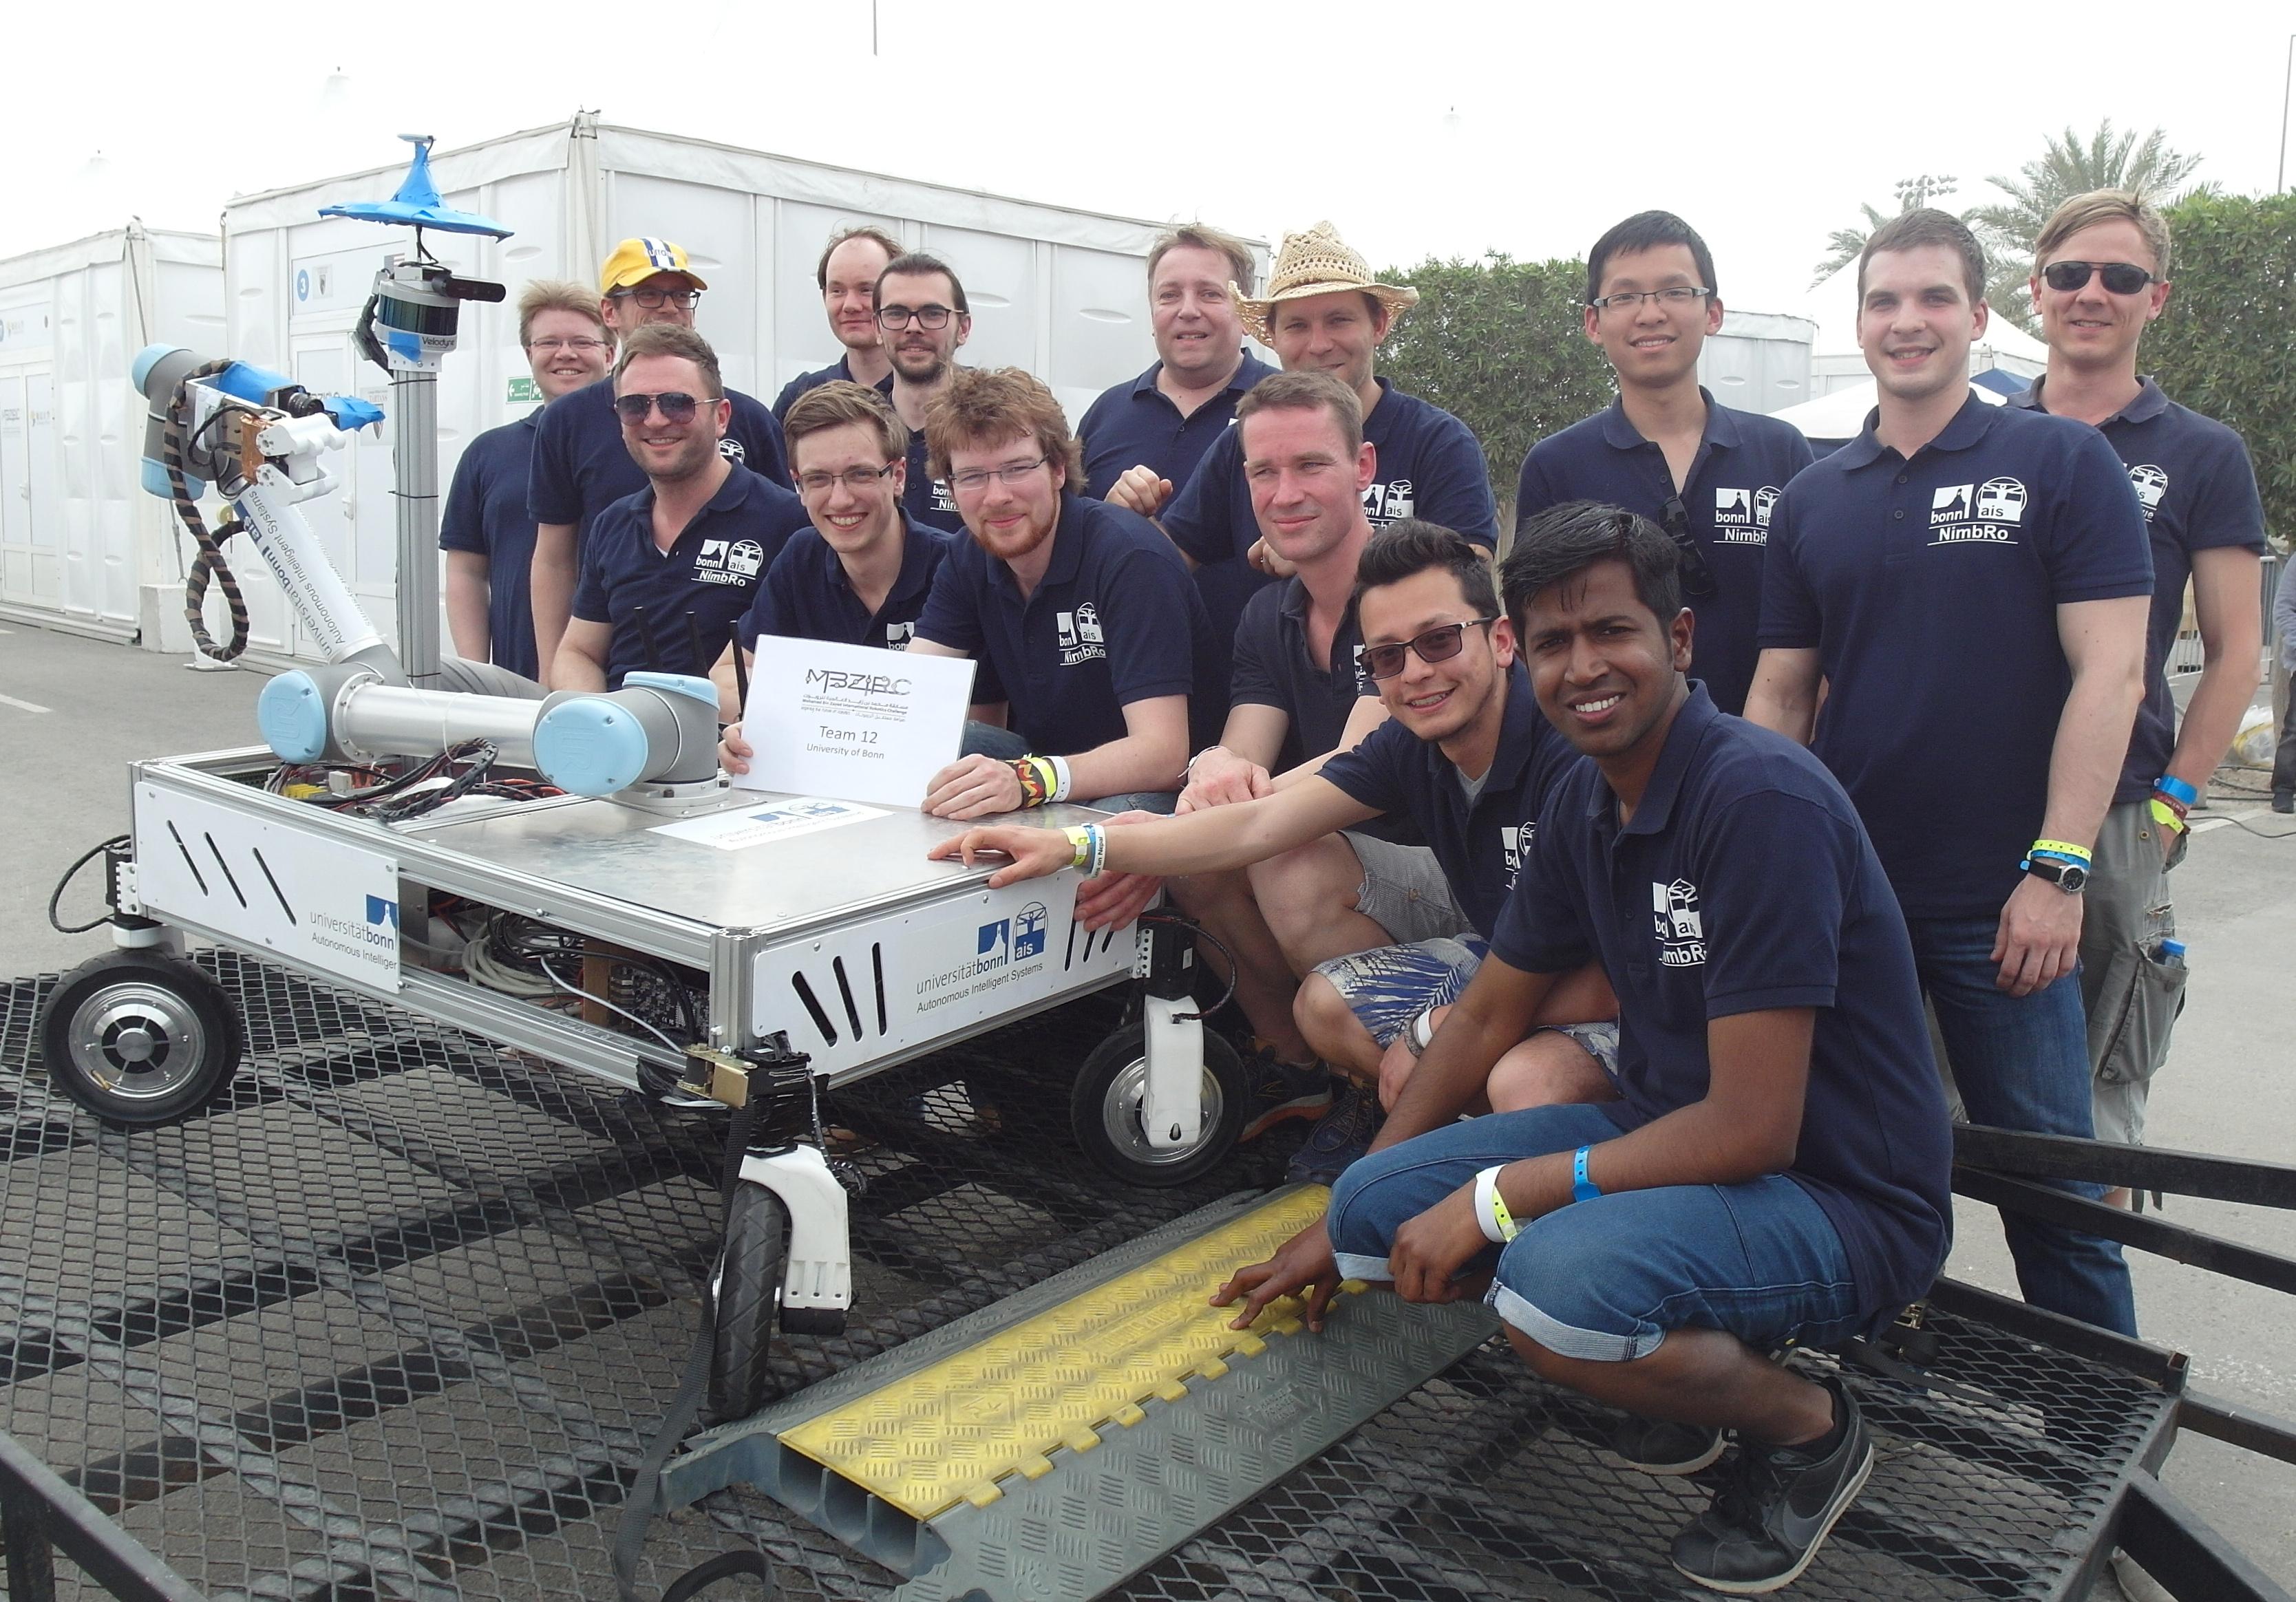 Team NimBro wins Mohamed Bin Zayed International Robotics Challenge 2017